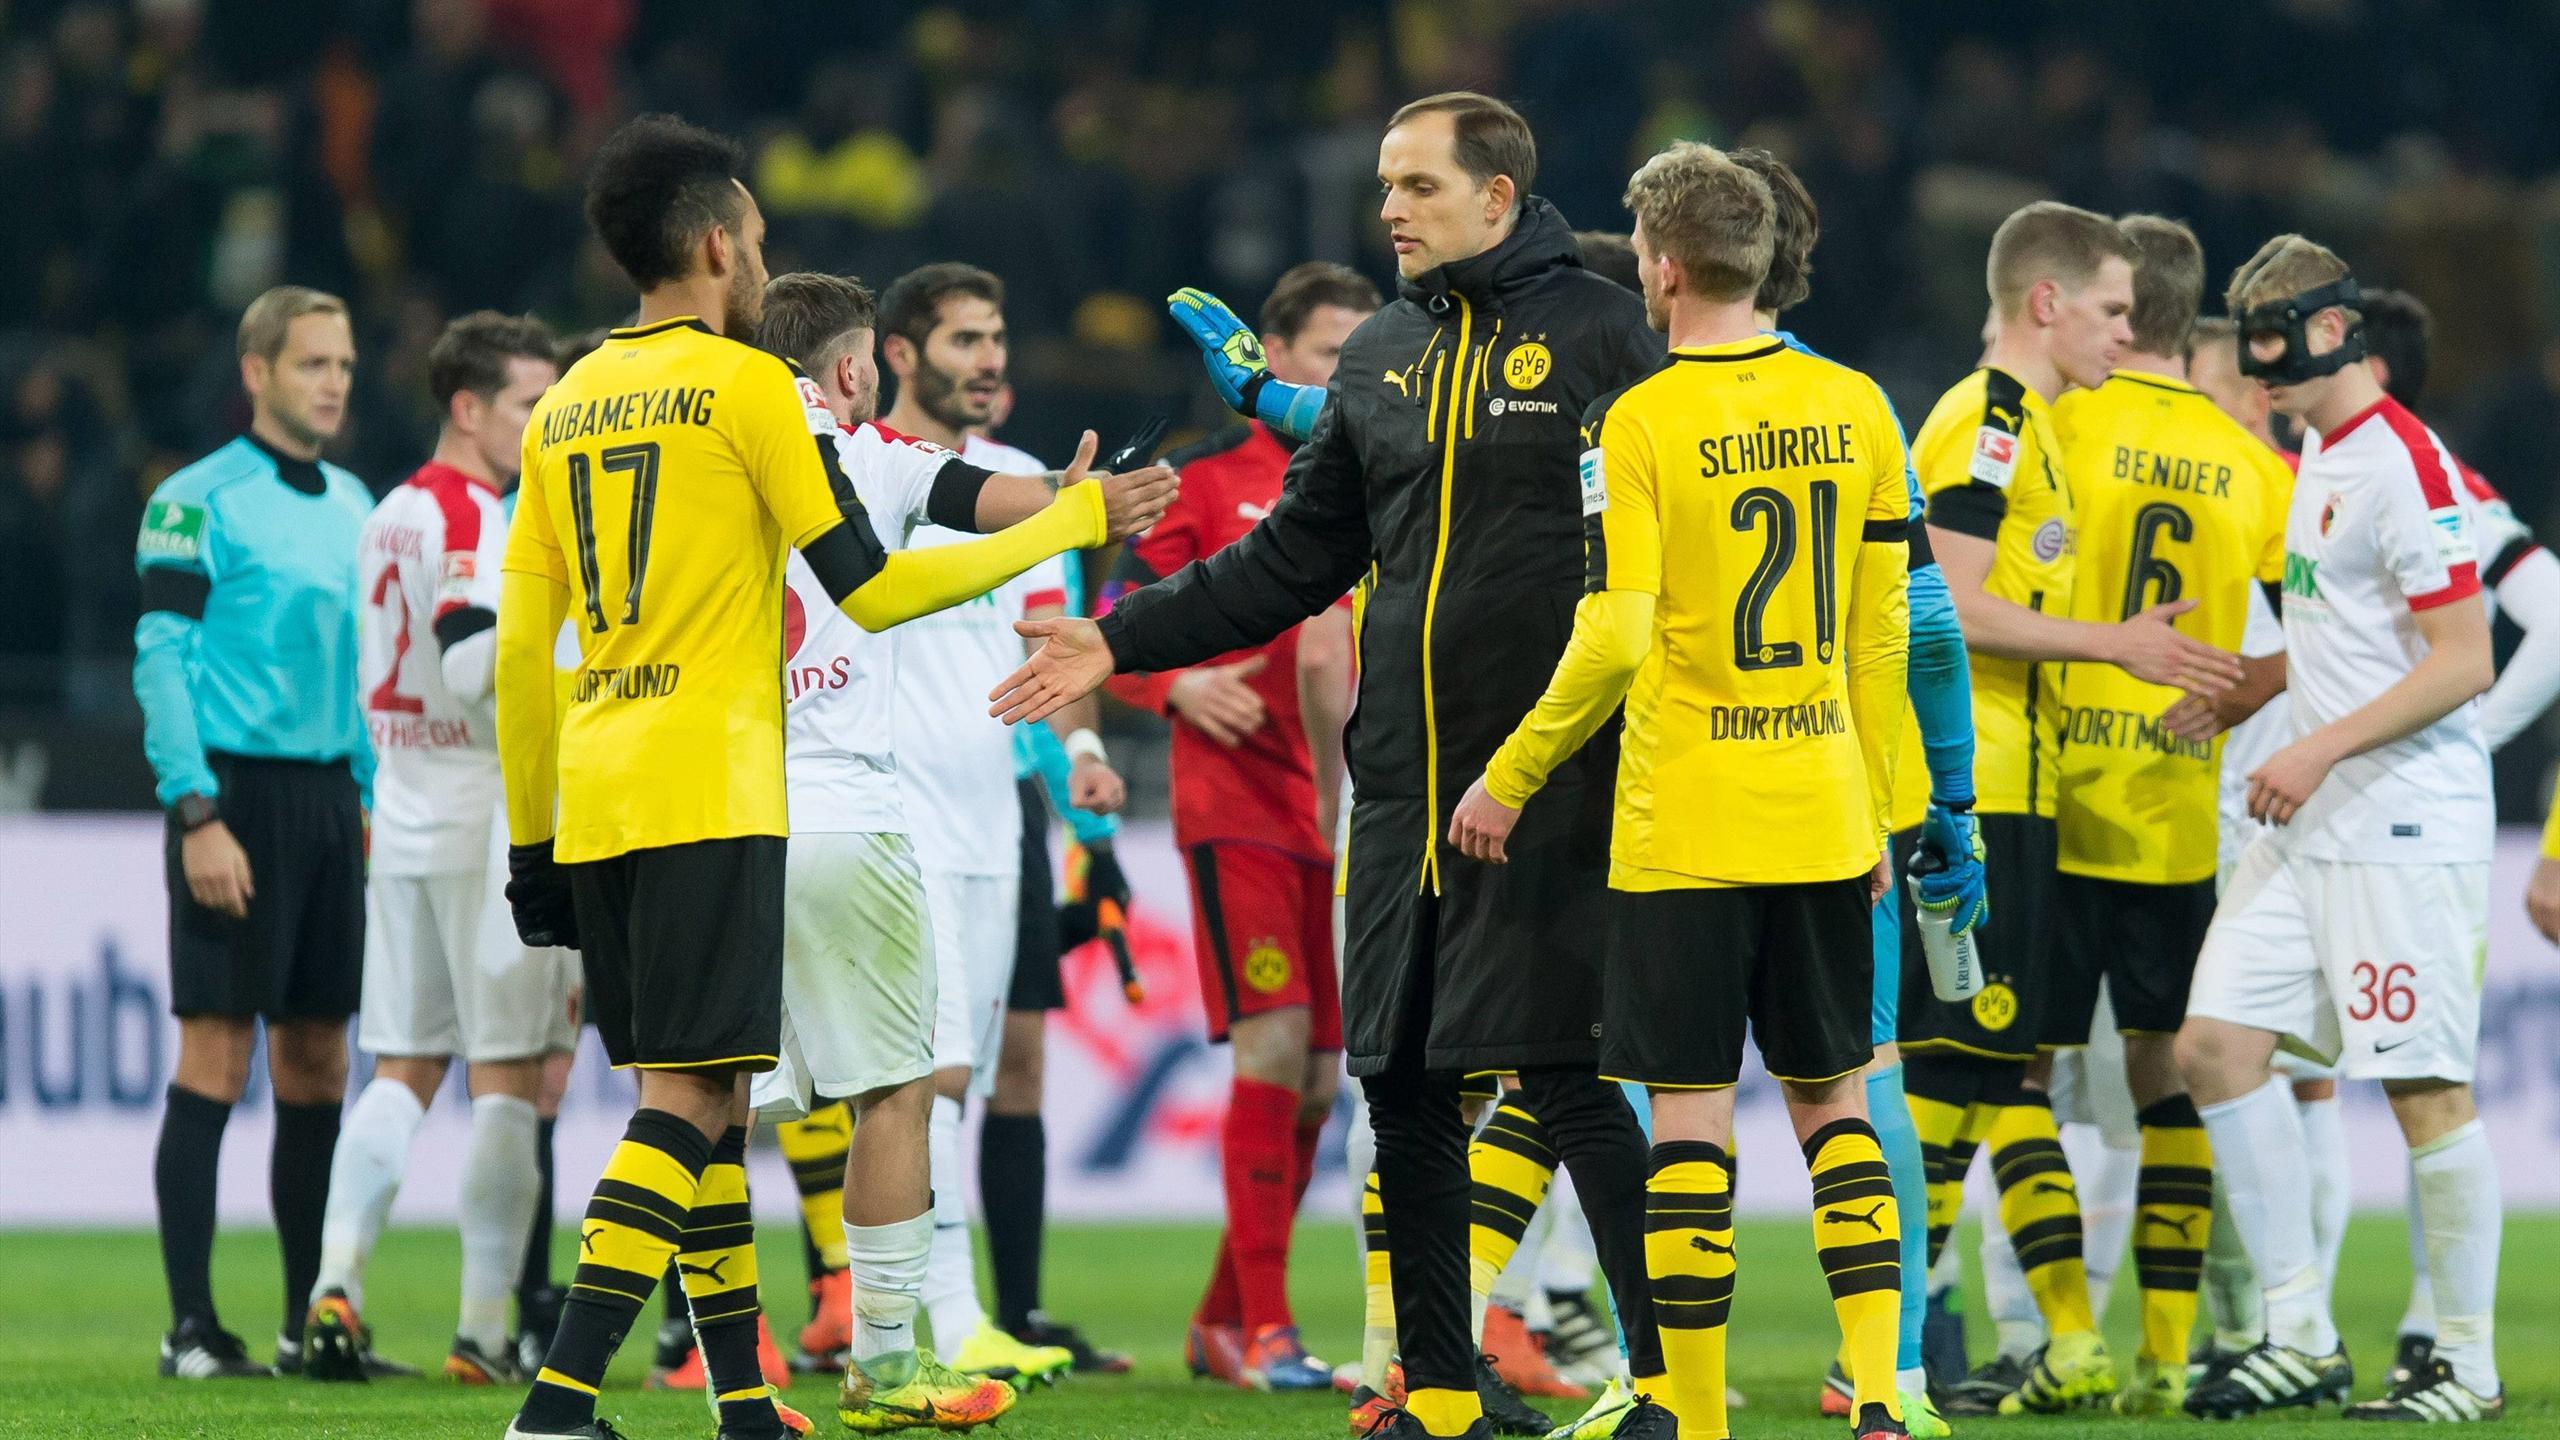 Schürrle Aubameyang Tuchel - Borussia Dortmund-Augsburg - Bundesliga 2016/2017 - Imago